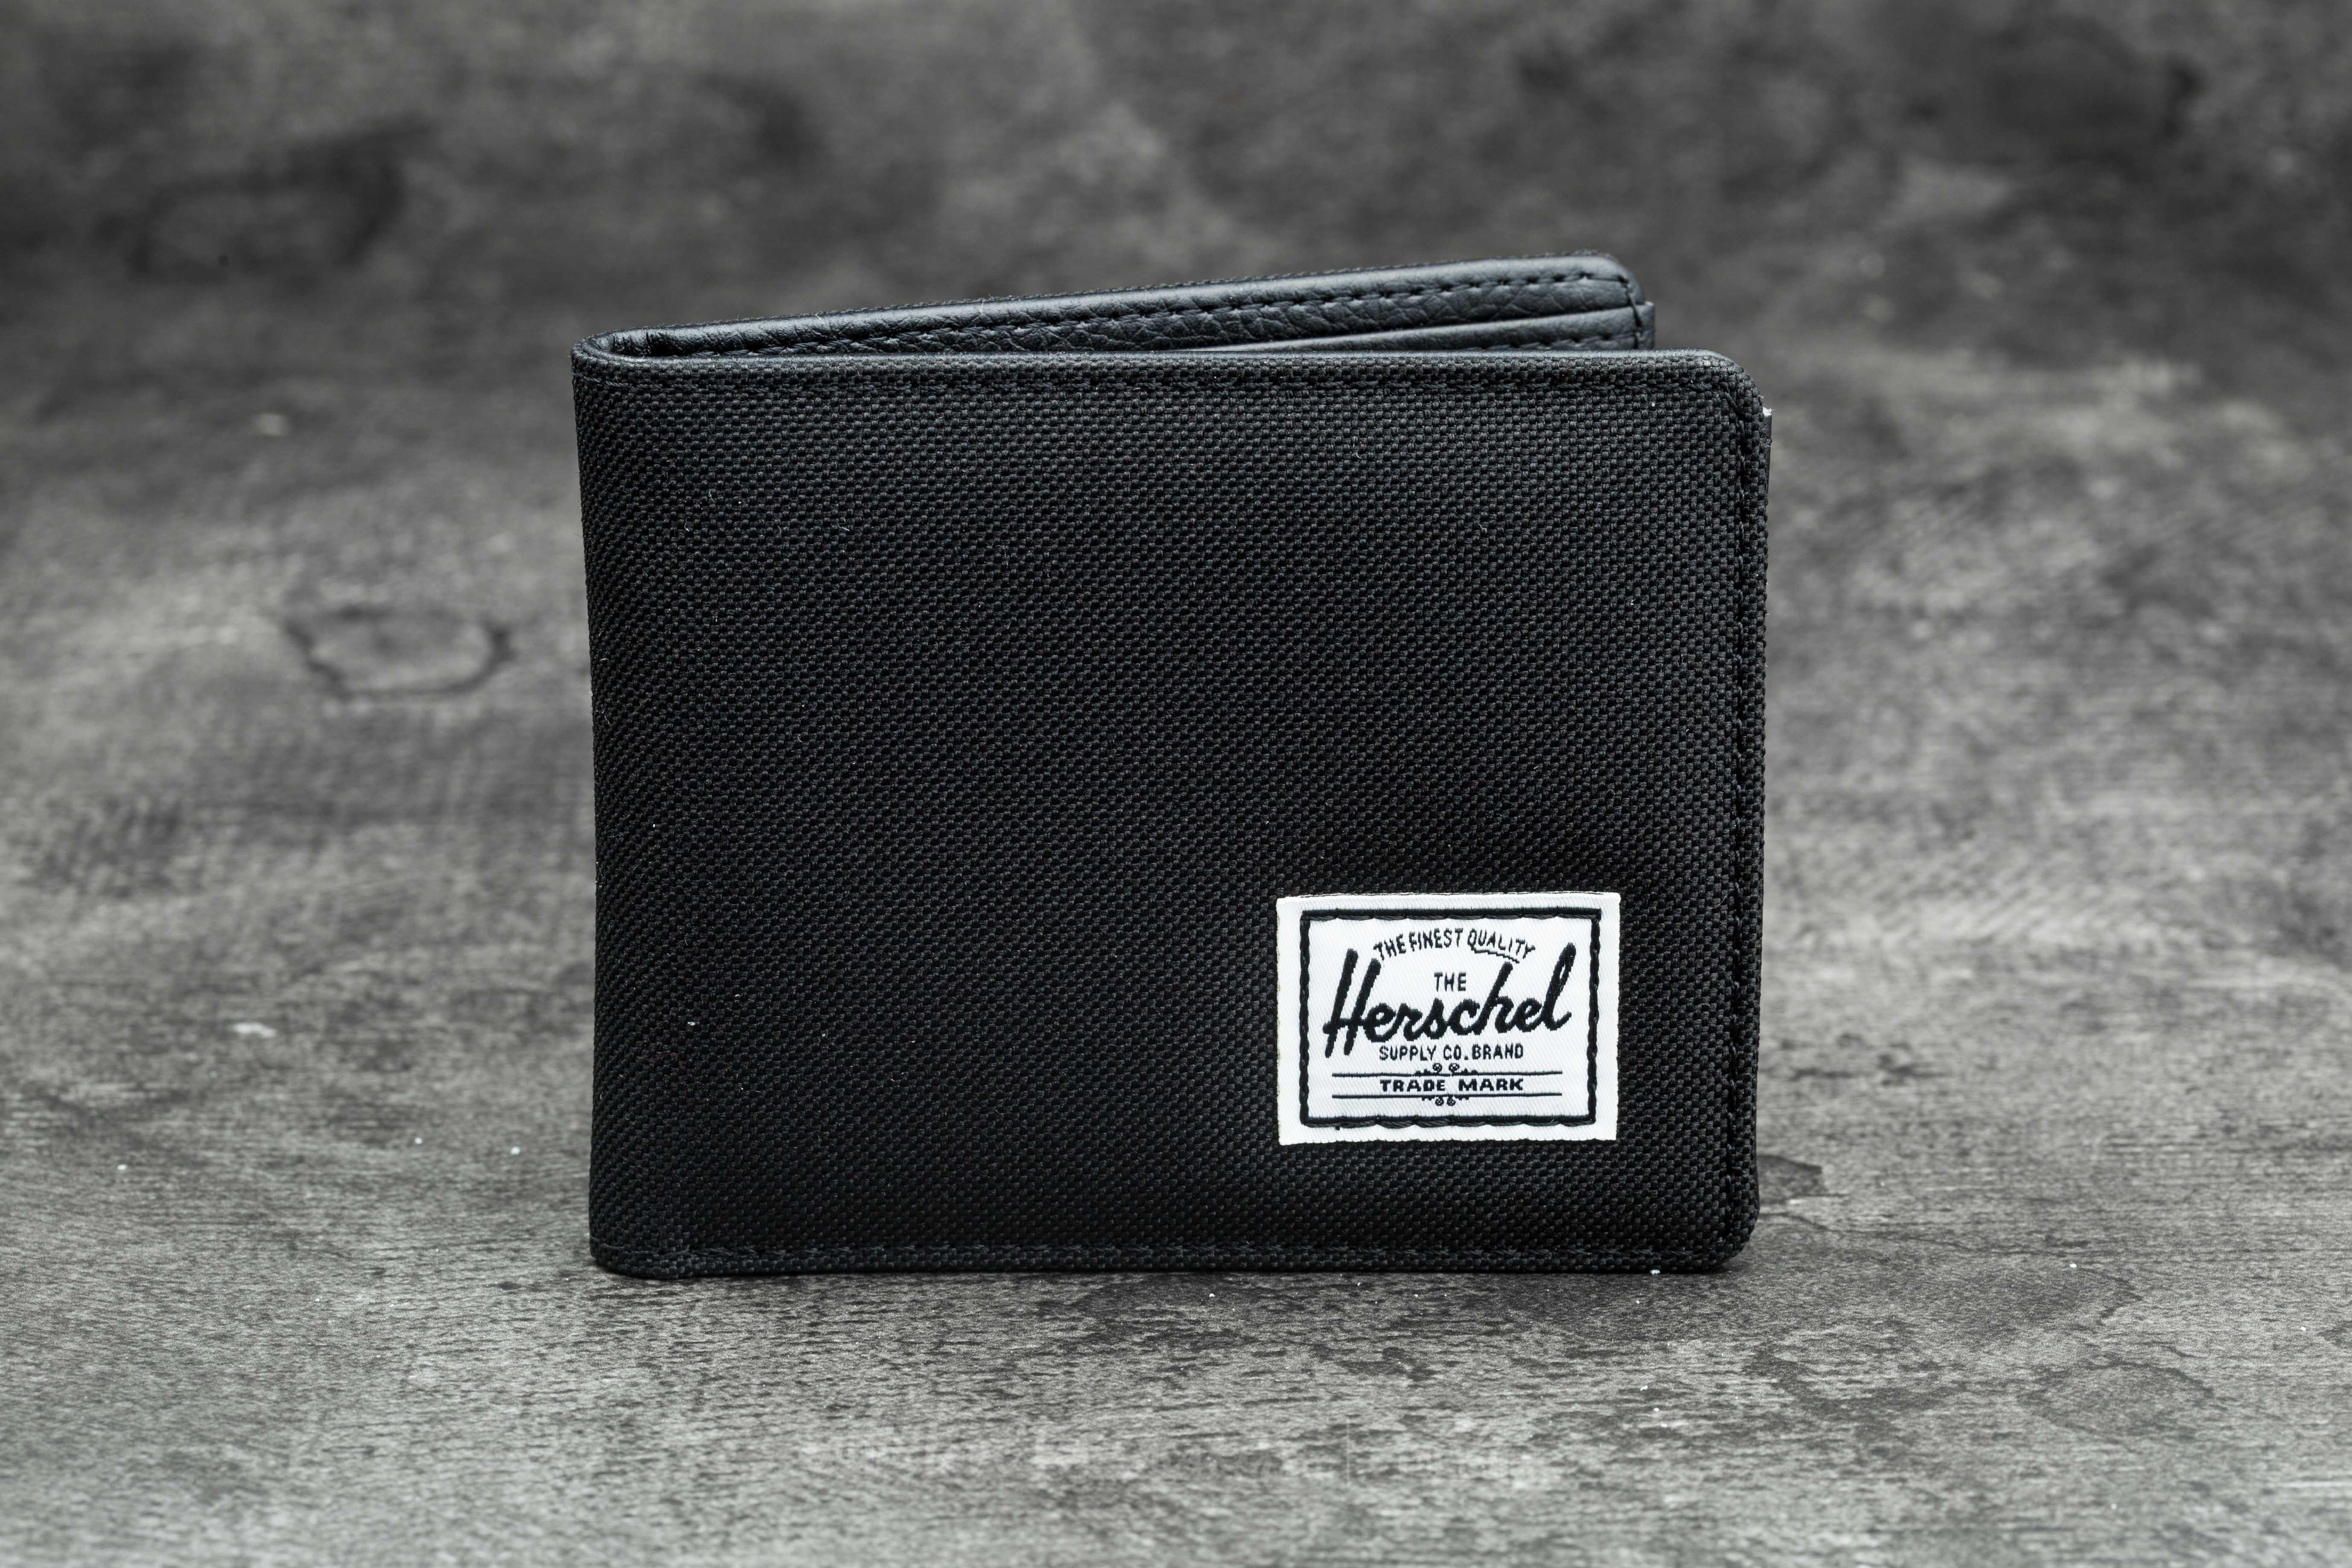 Herschel Supply Co. Hank Wallet Black/ Black Synthetic Leather - 10079